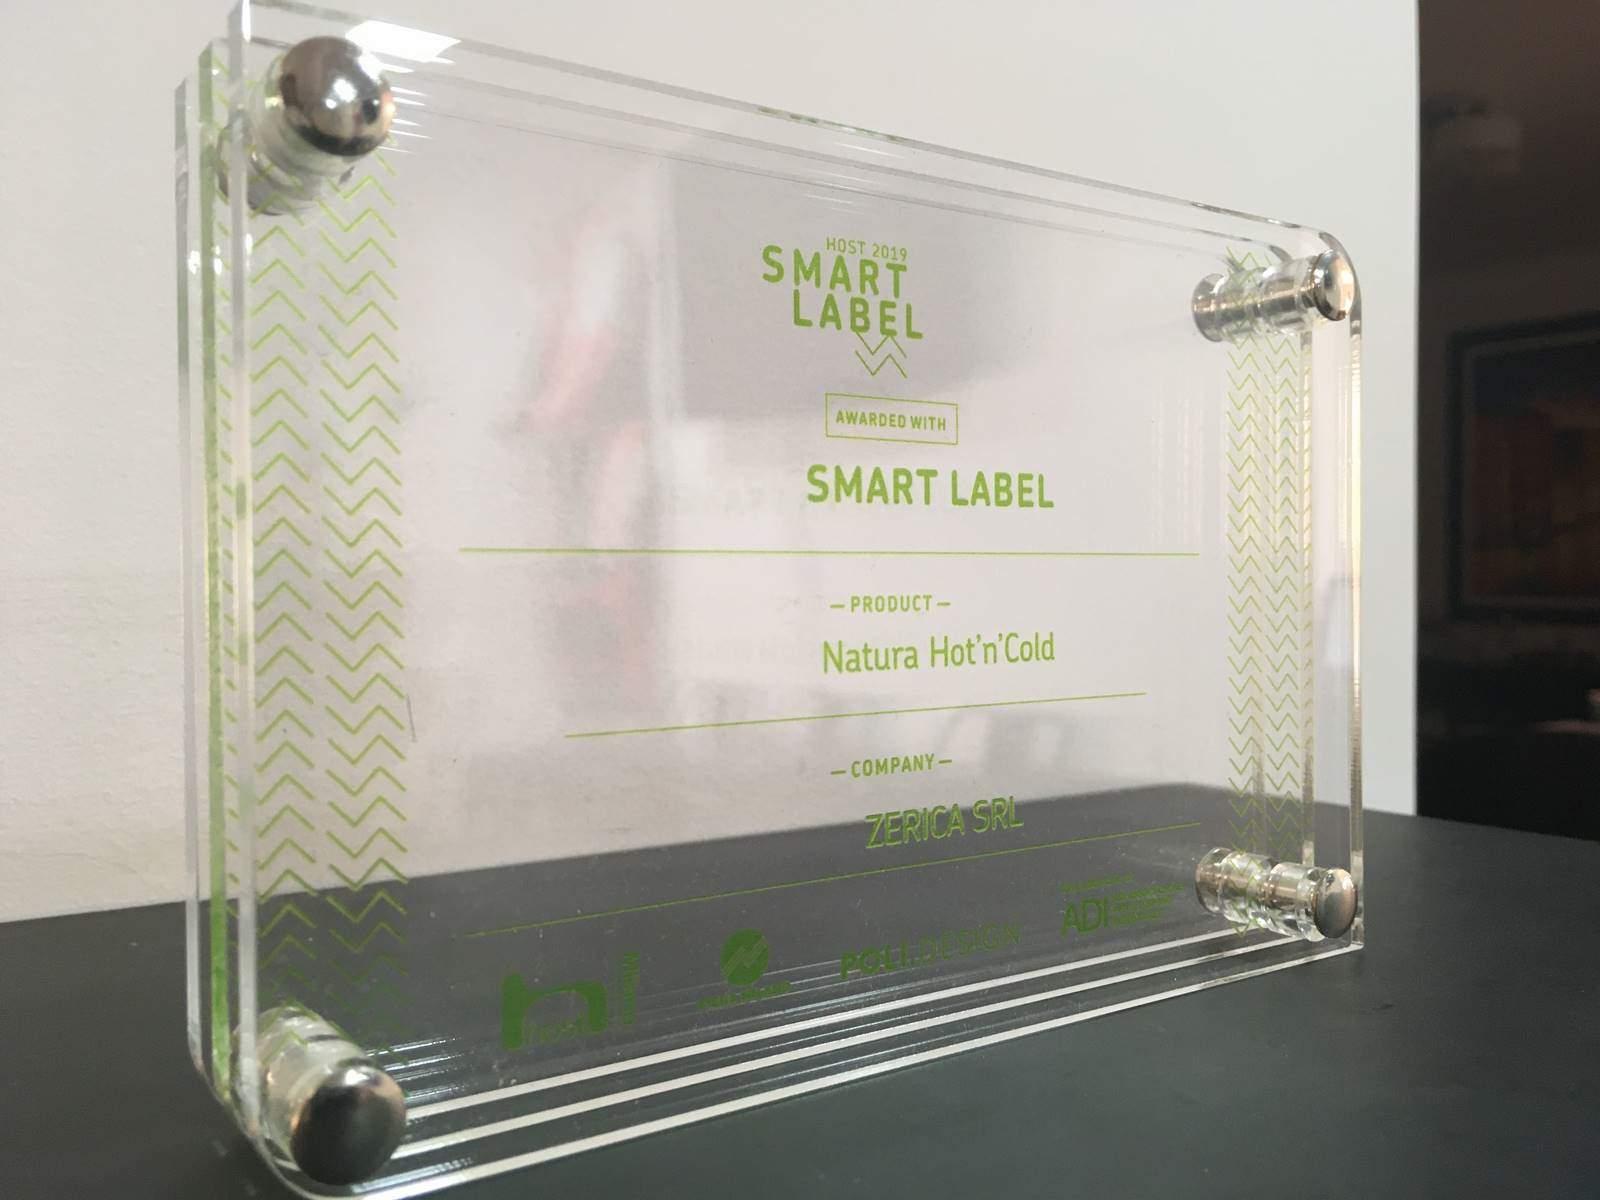 Smart Label Innovation Award 2019